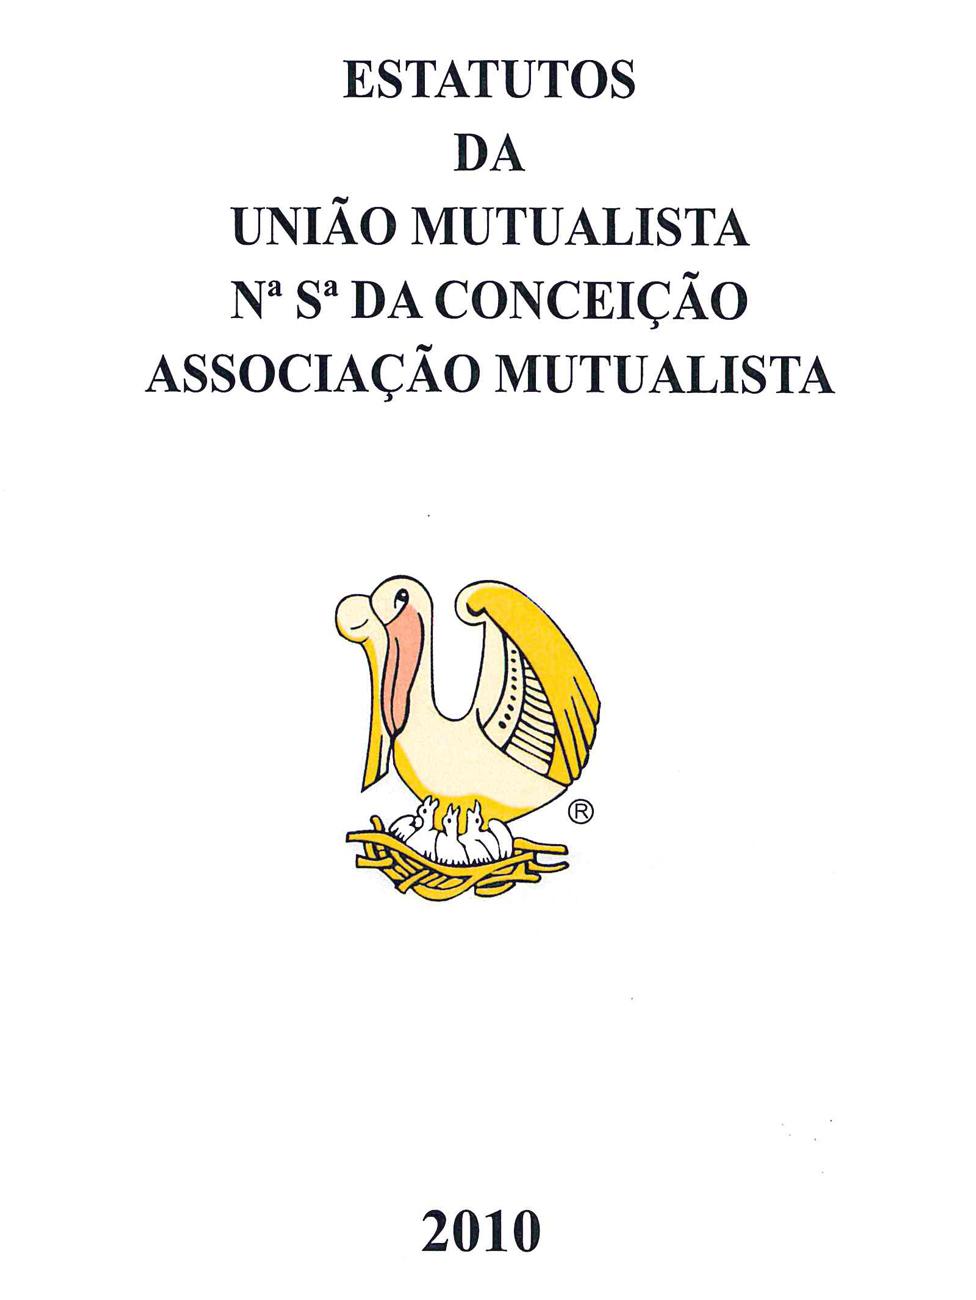 Estatutos_2010-1